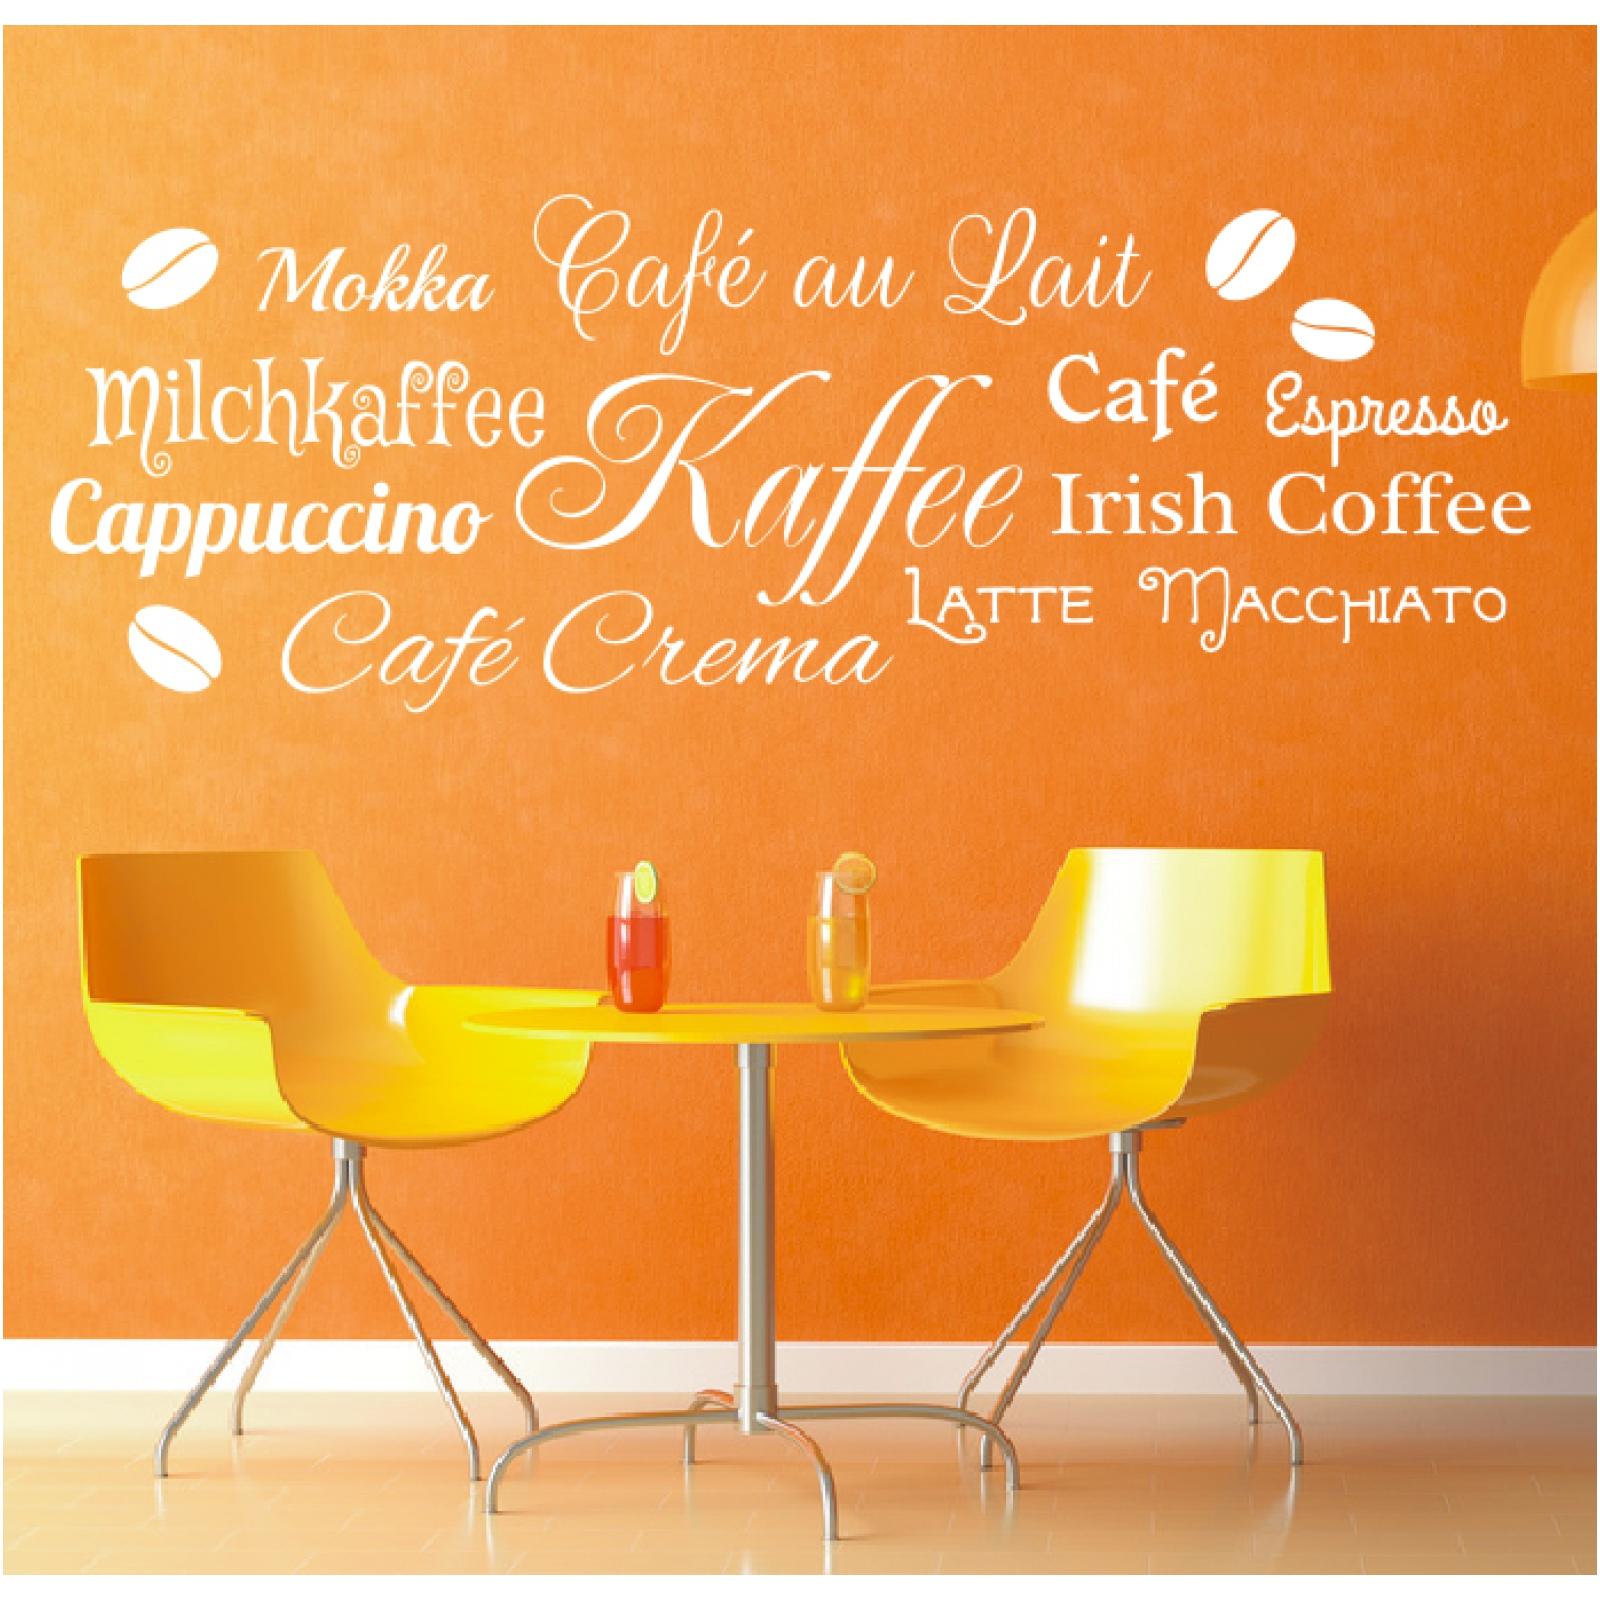 Perfekt Entzuckend Kaffee U2013 Latte Macchiato, Milchkaffee, Cappuccino, Espresso,  Café Au Lait,